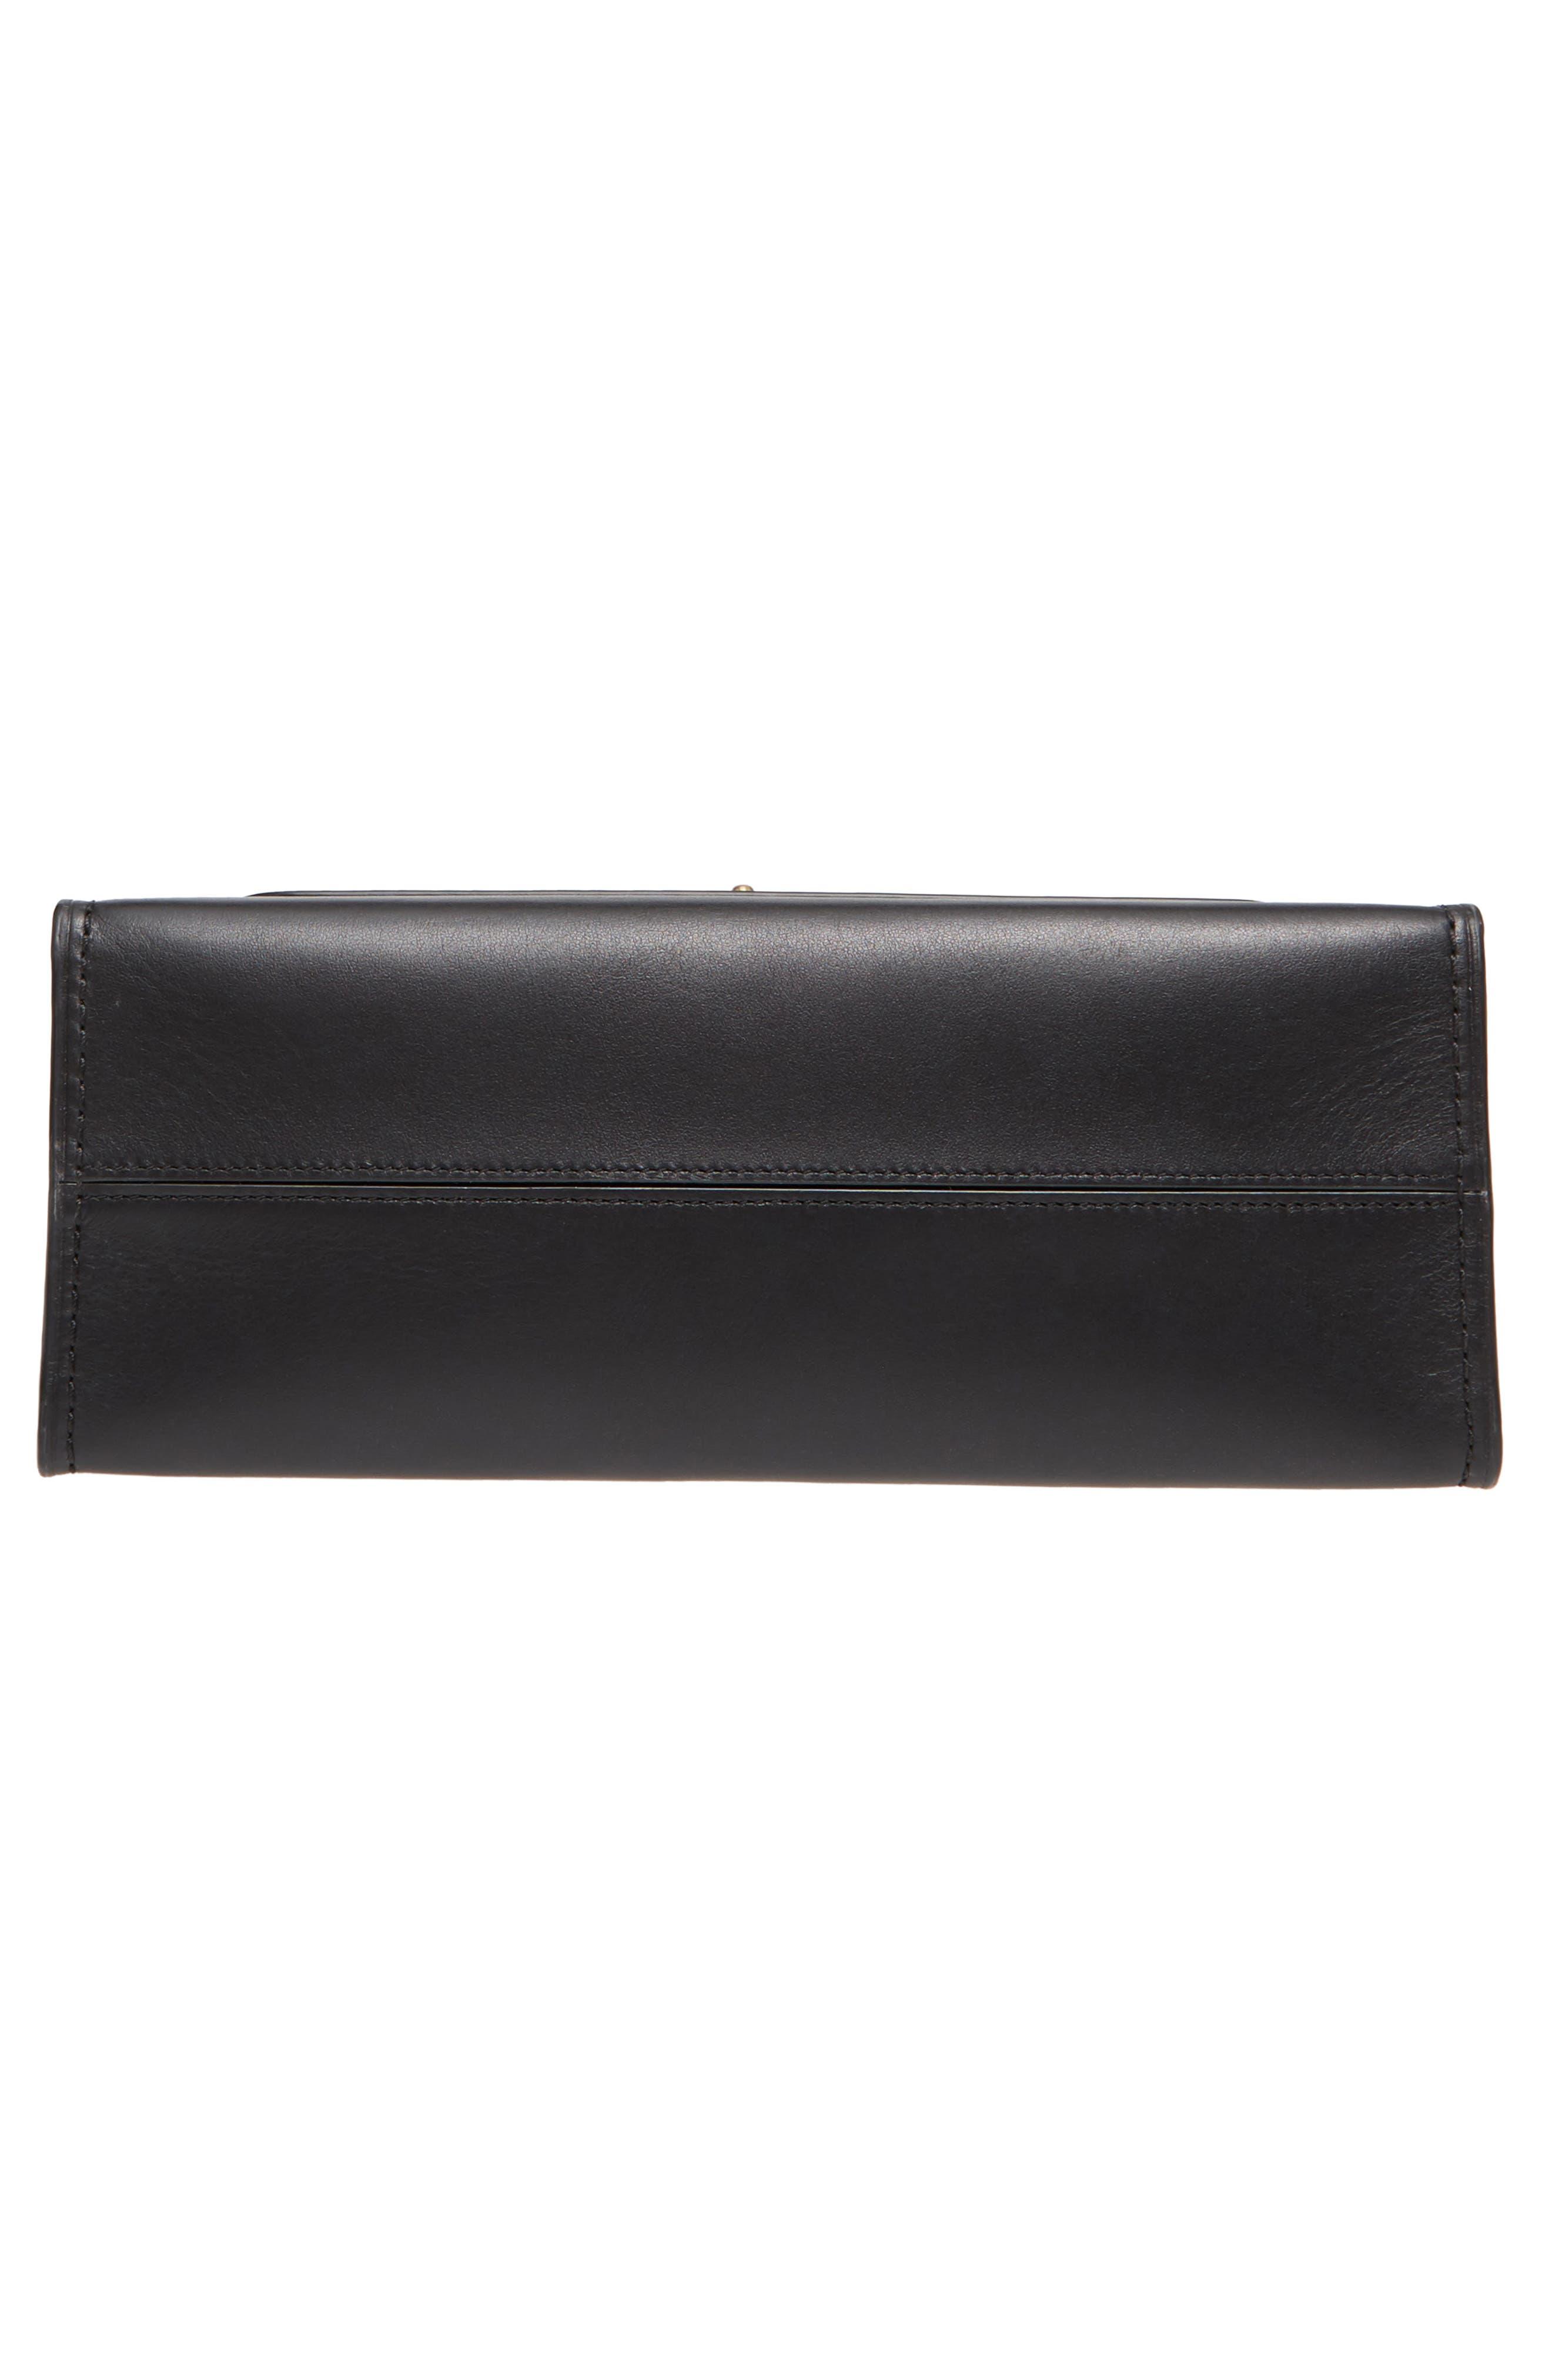 COACH,                             Parker Leather Shoulder Bag,                             Alternate thumbnail 6, color,                             001